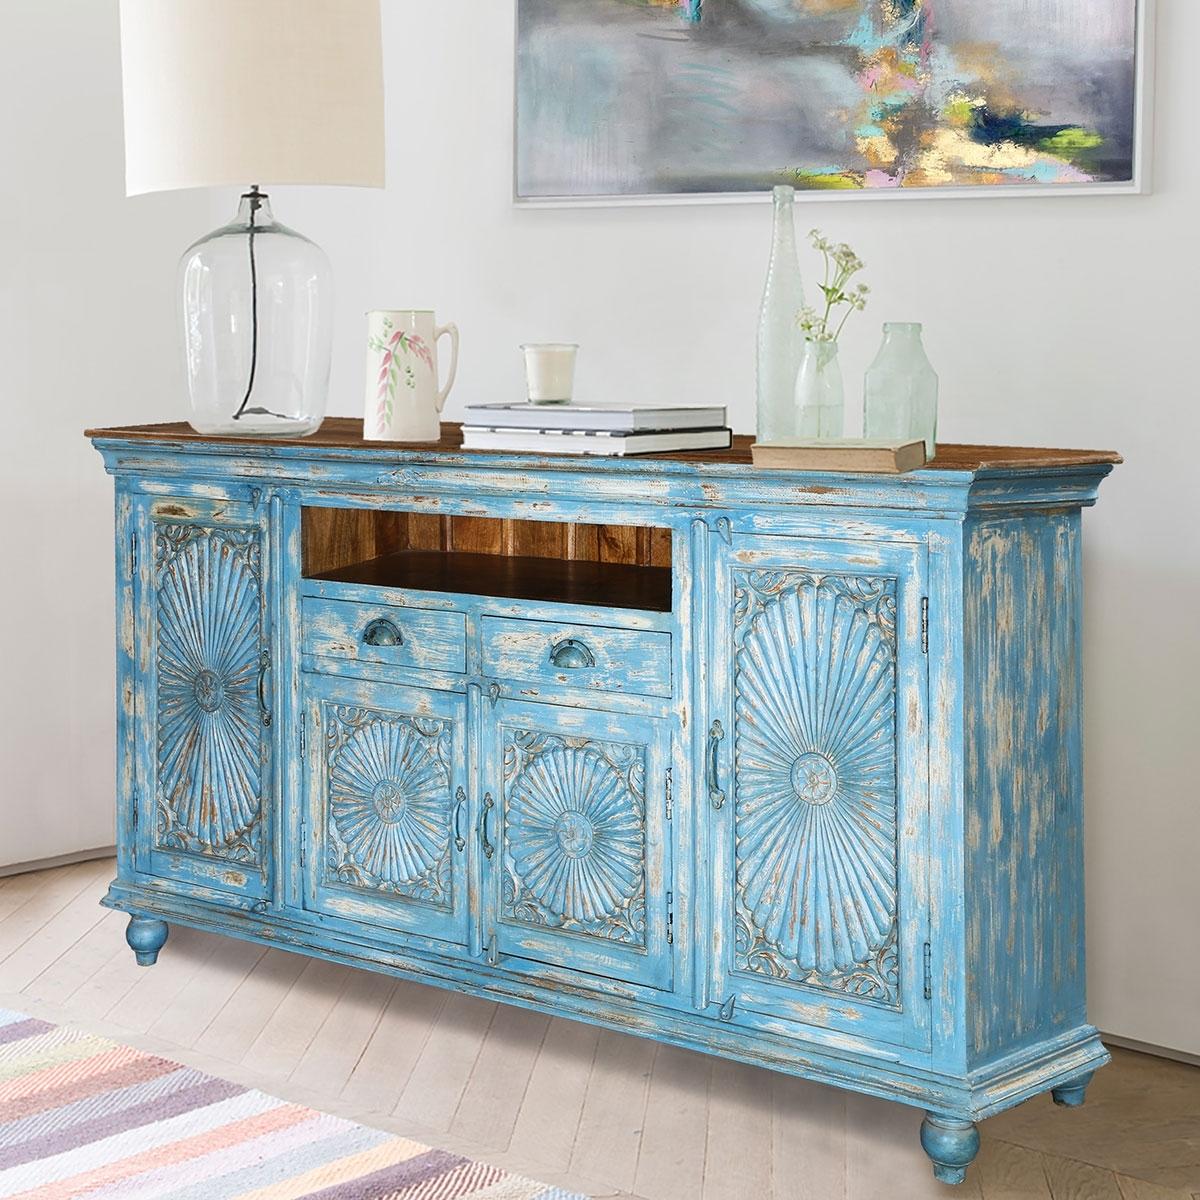 Sky Blue Starburst Handcrafted Mango Wood 2 Drawer Buffet Cabinet Regarding Latest Starburst 3 Door Sideboards (#15 of 20)